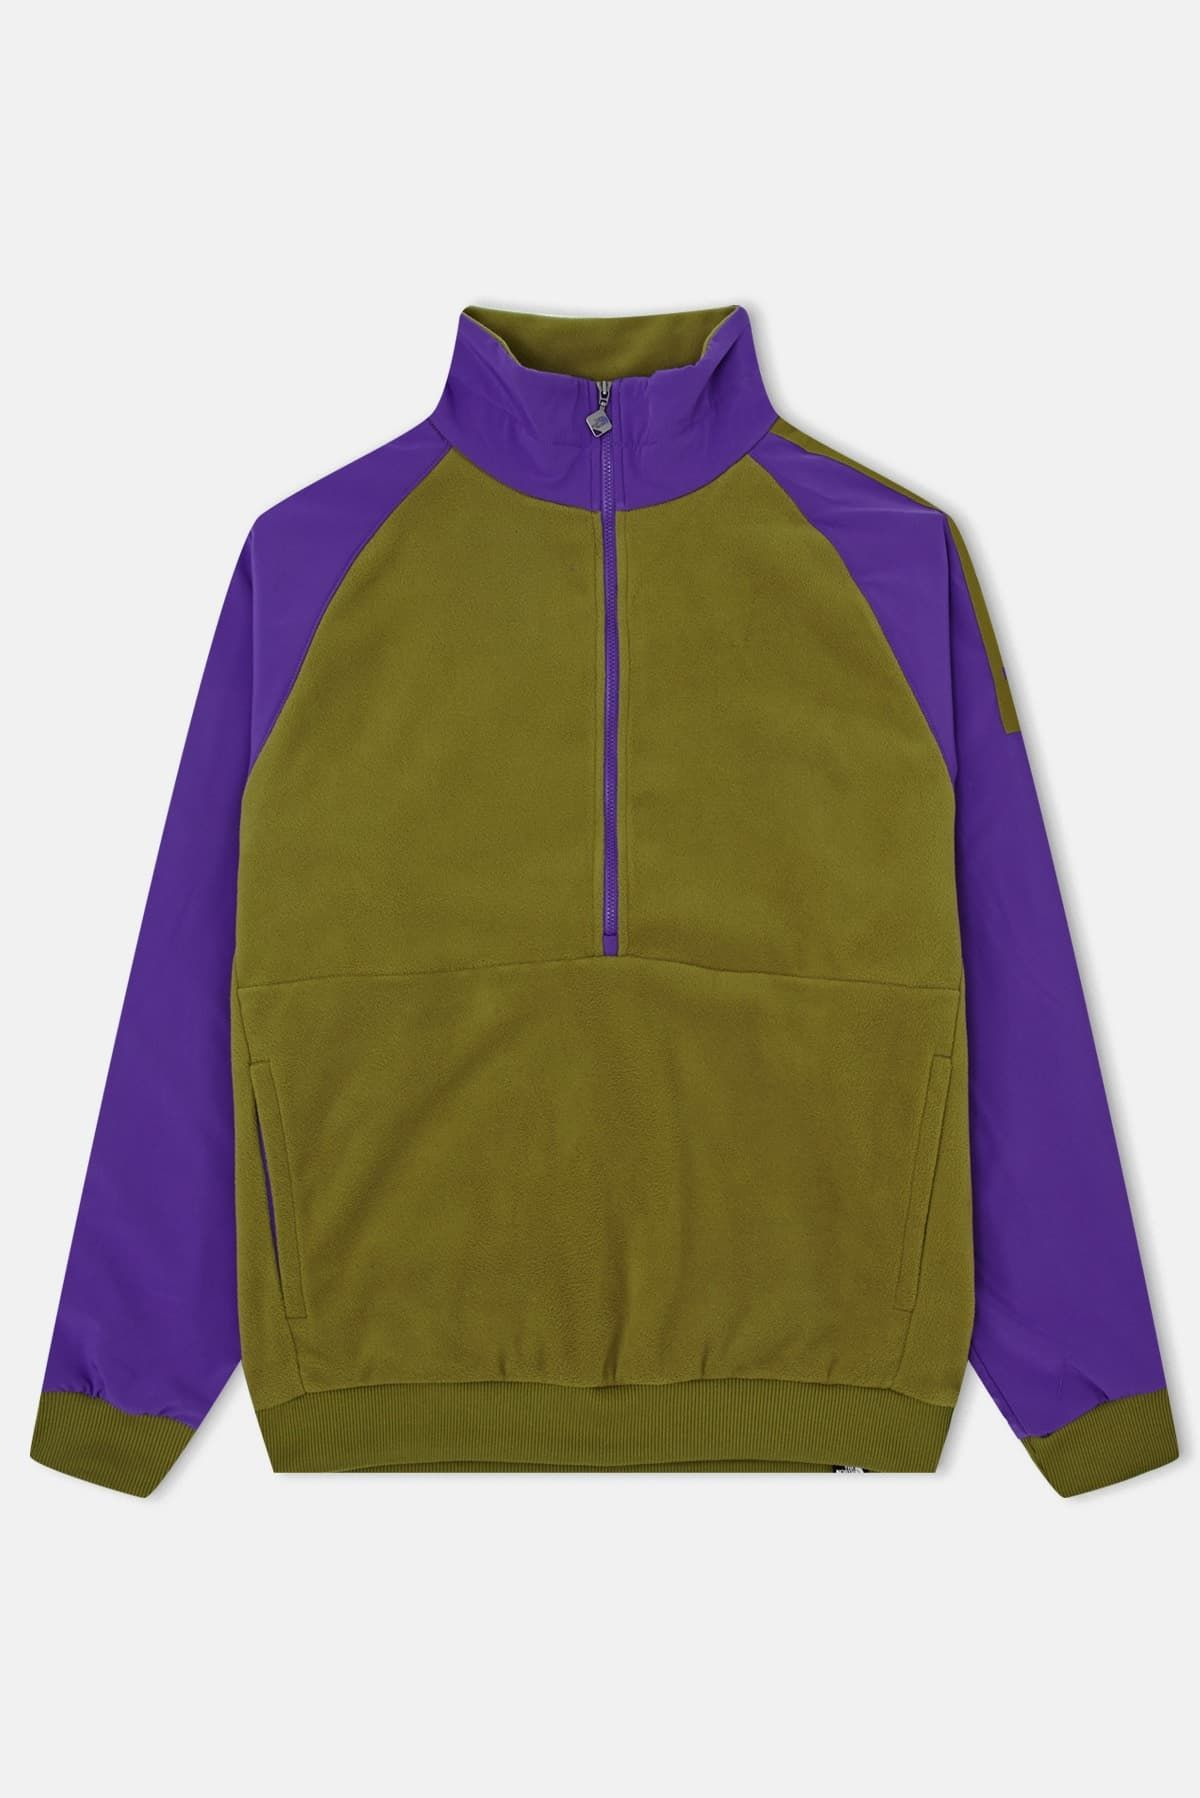 North Face Capsule M Ex 14 Zip Fleece Fleece available from